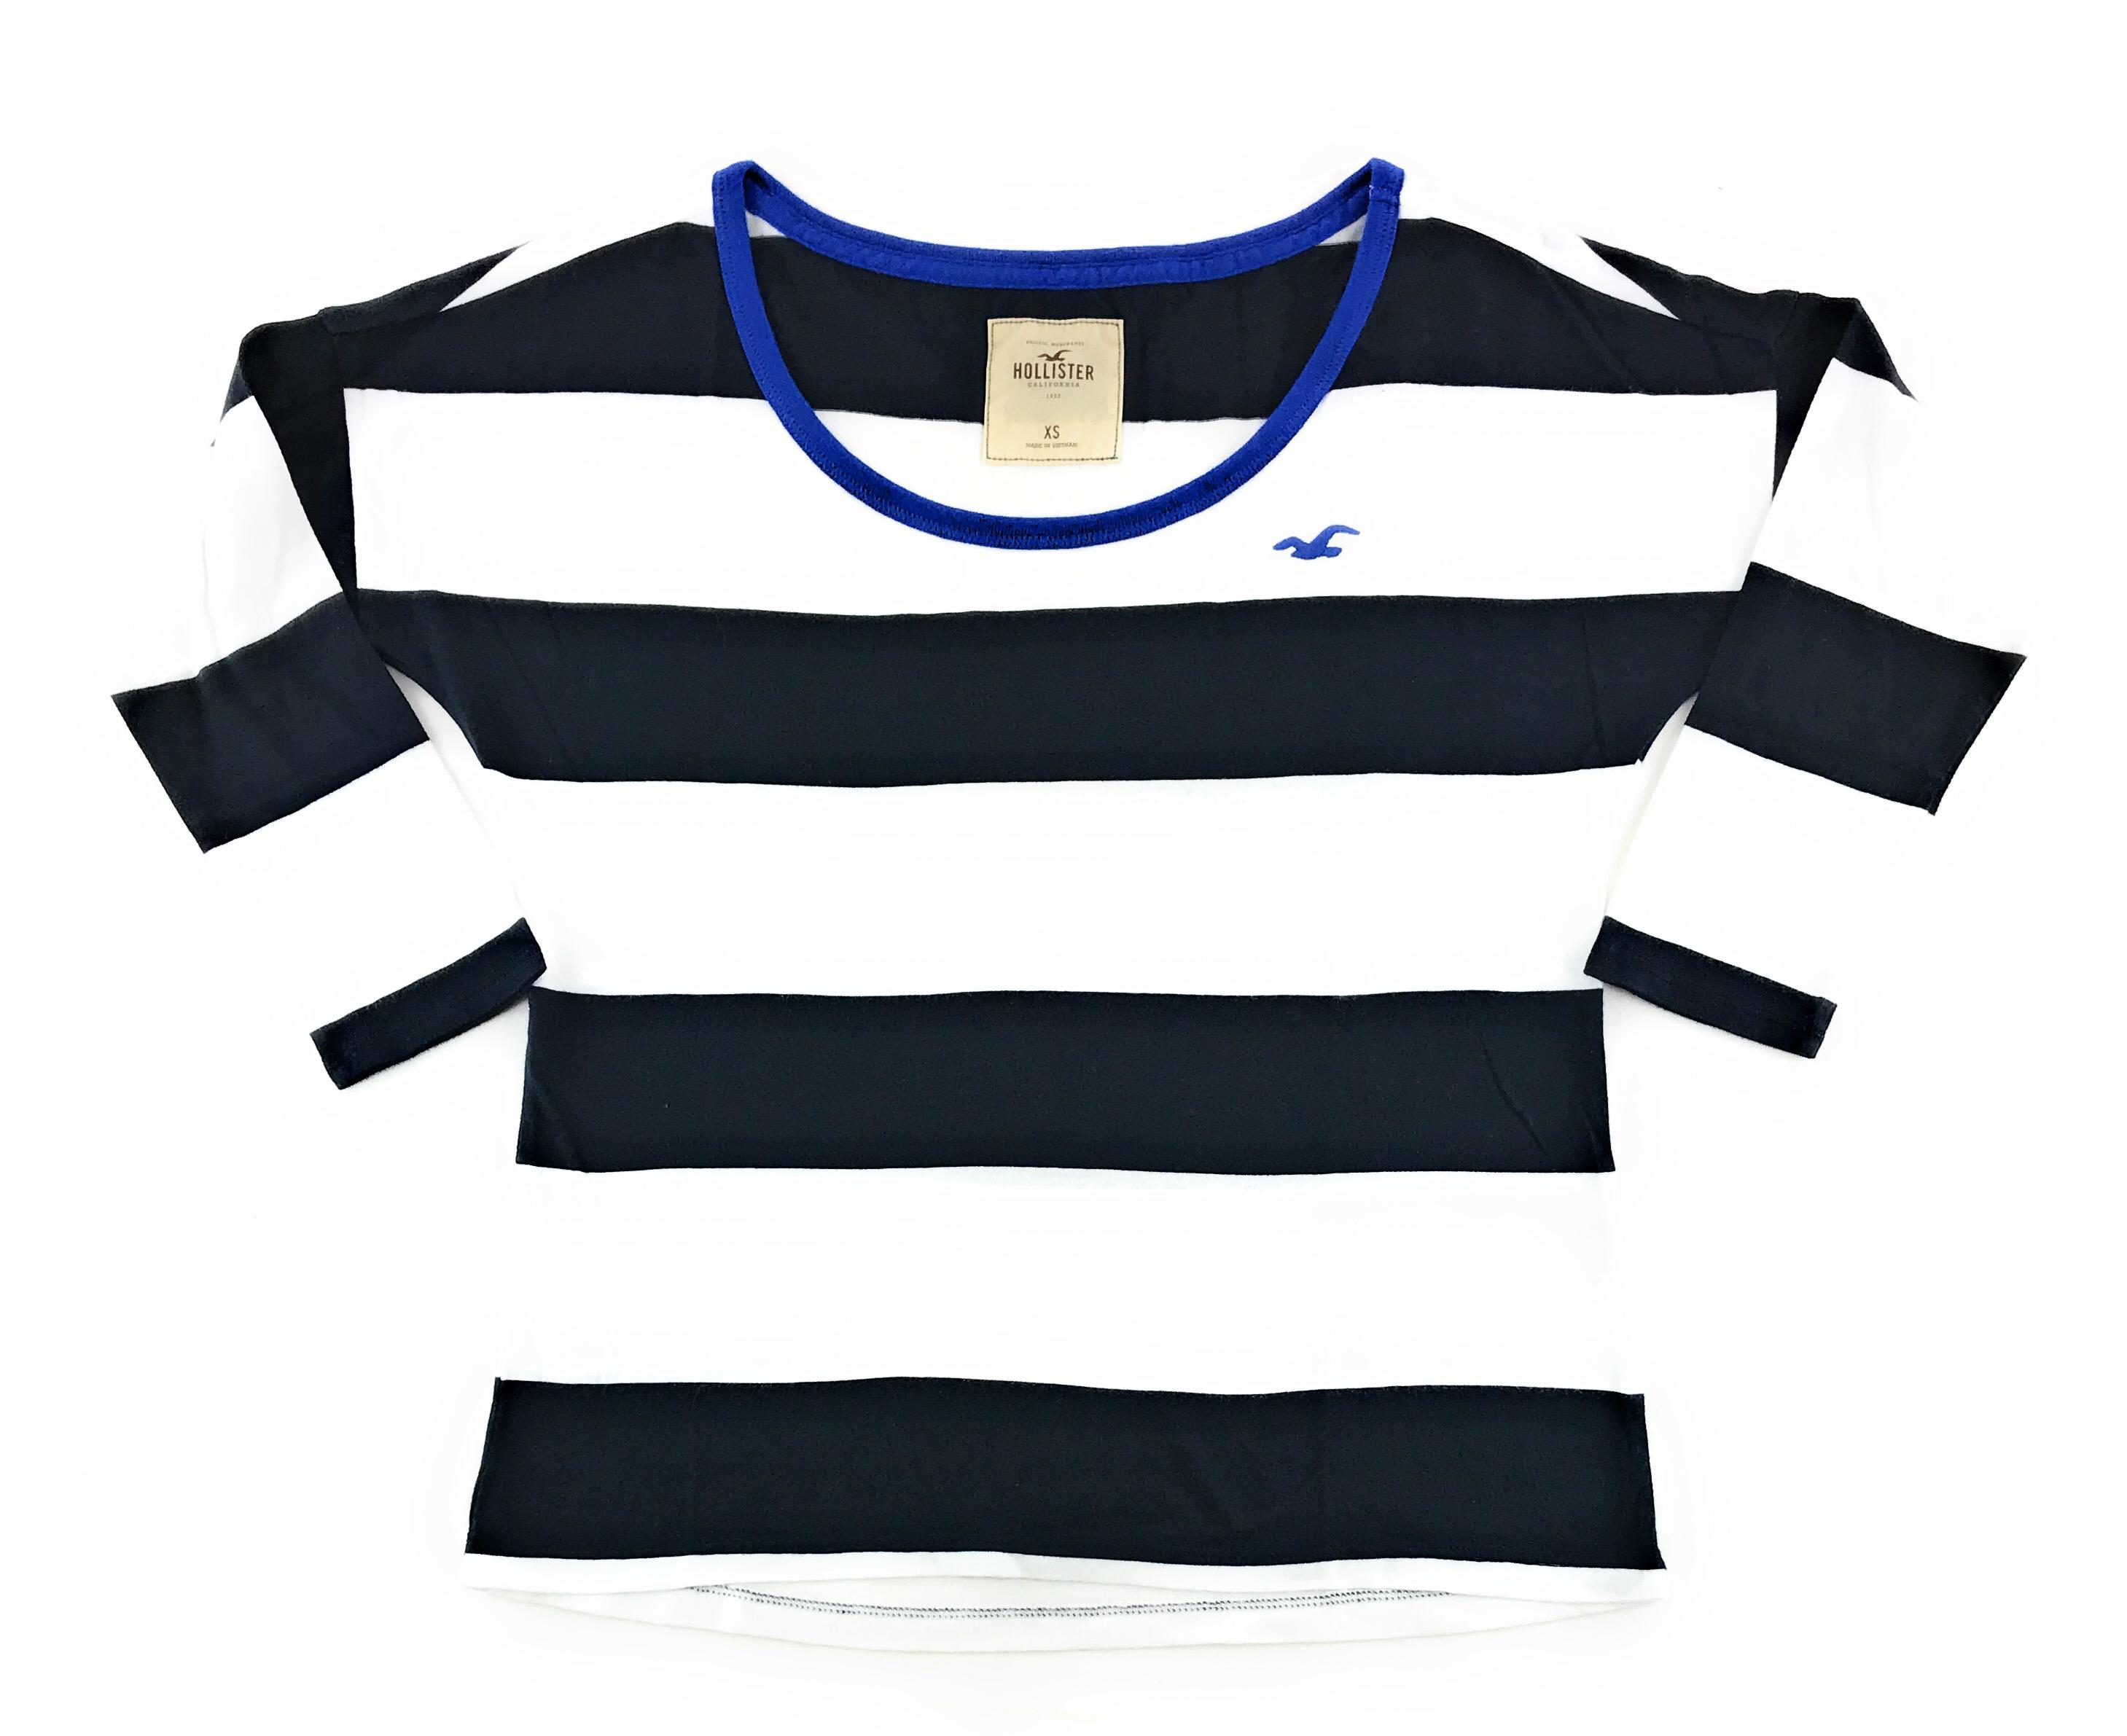 67f1684e9d0ab Hollister Womens T-Shirt Tee Embroidered Logos Long Three Quarter Sleeve